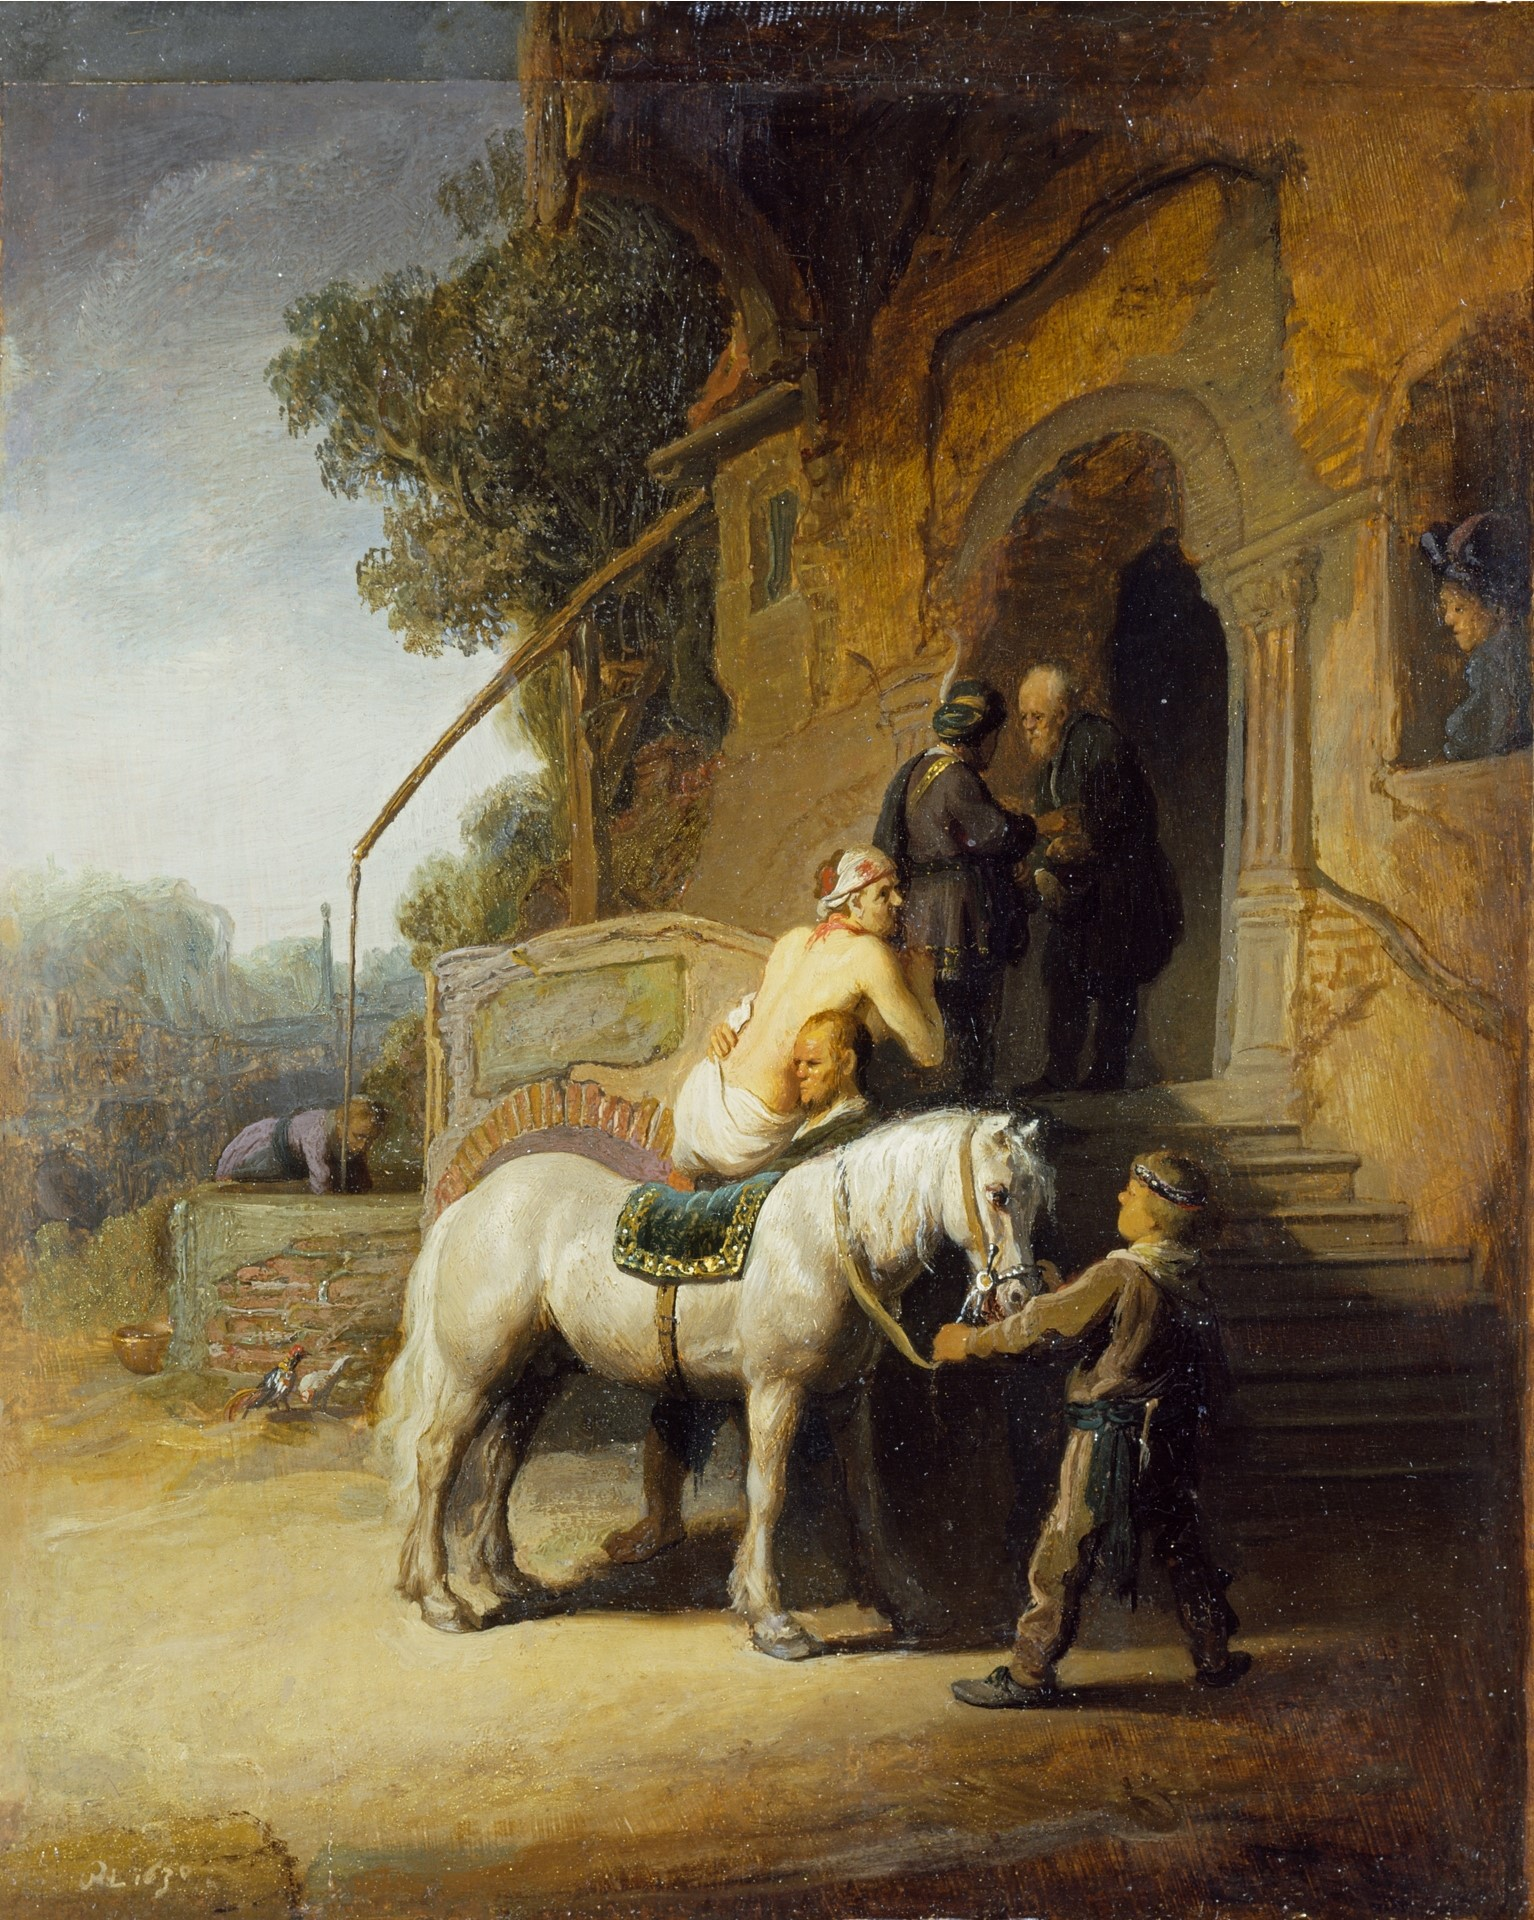 The Good Samaritan - Rembrandt (Wikipedia Commons)